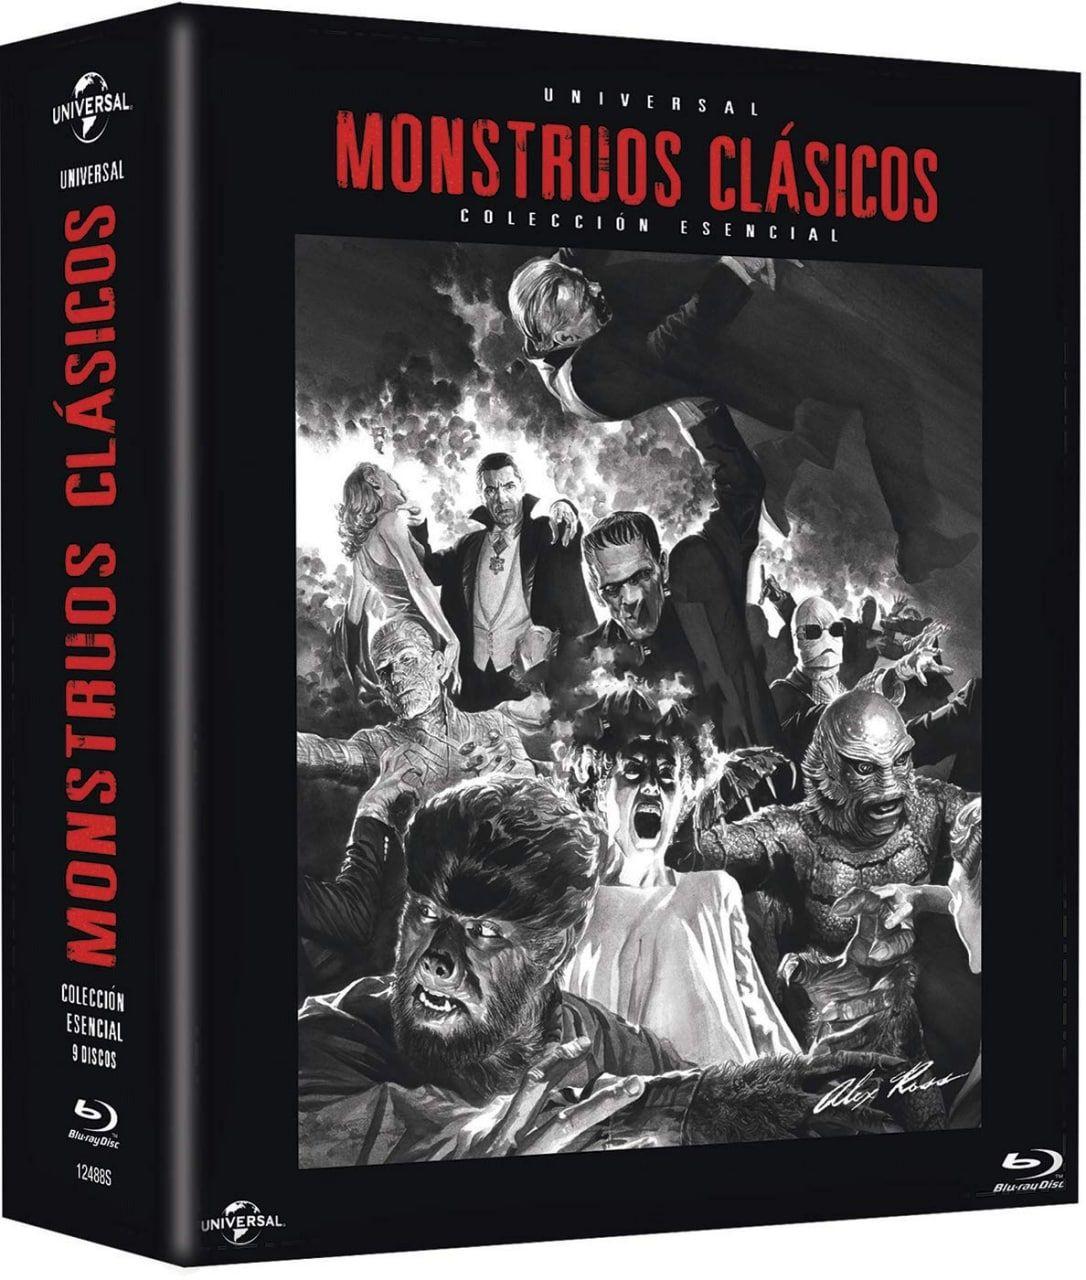 Pack: Monstruos Clásicos Universal